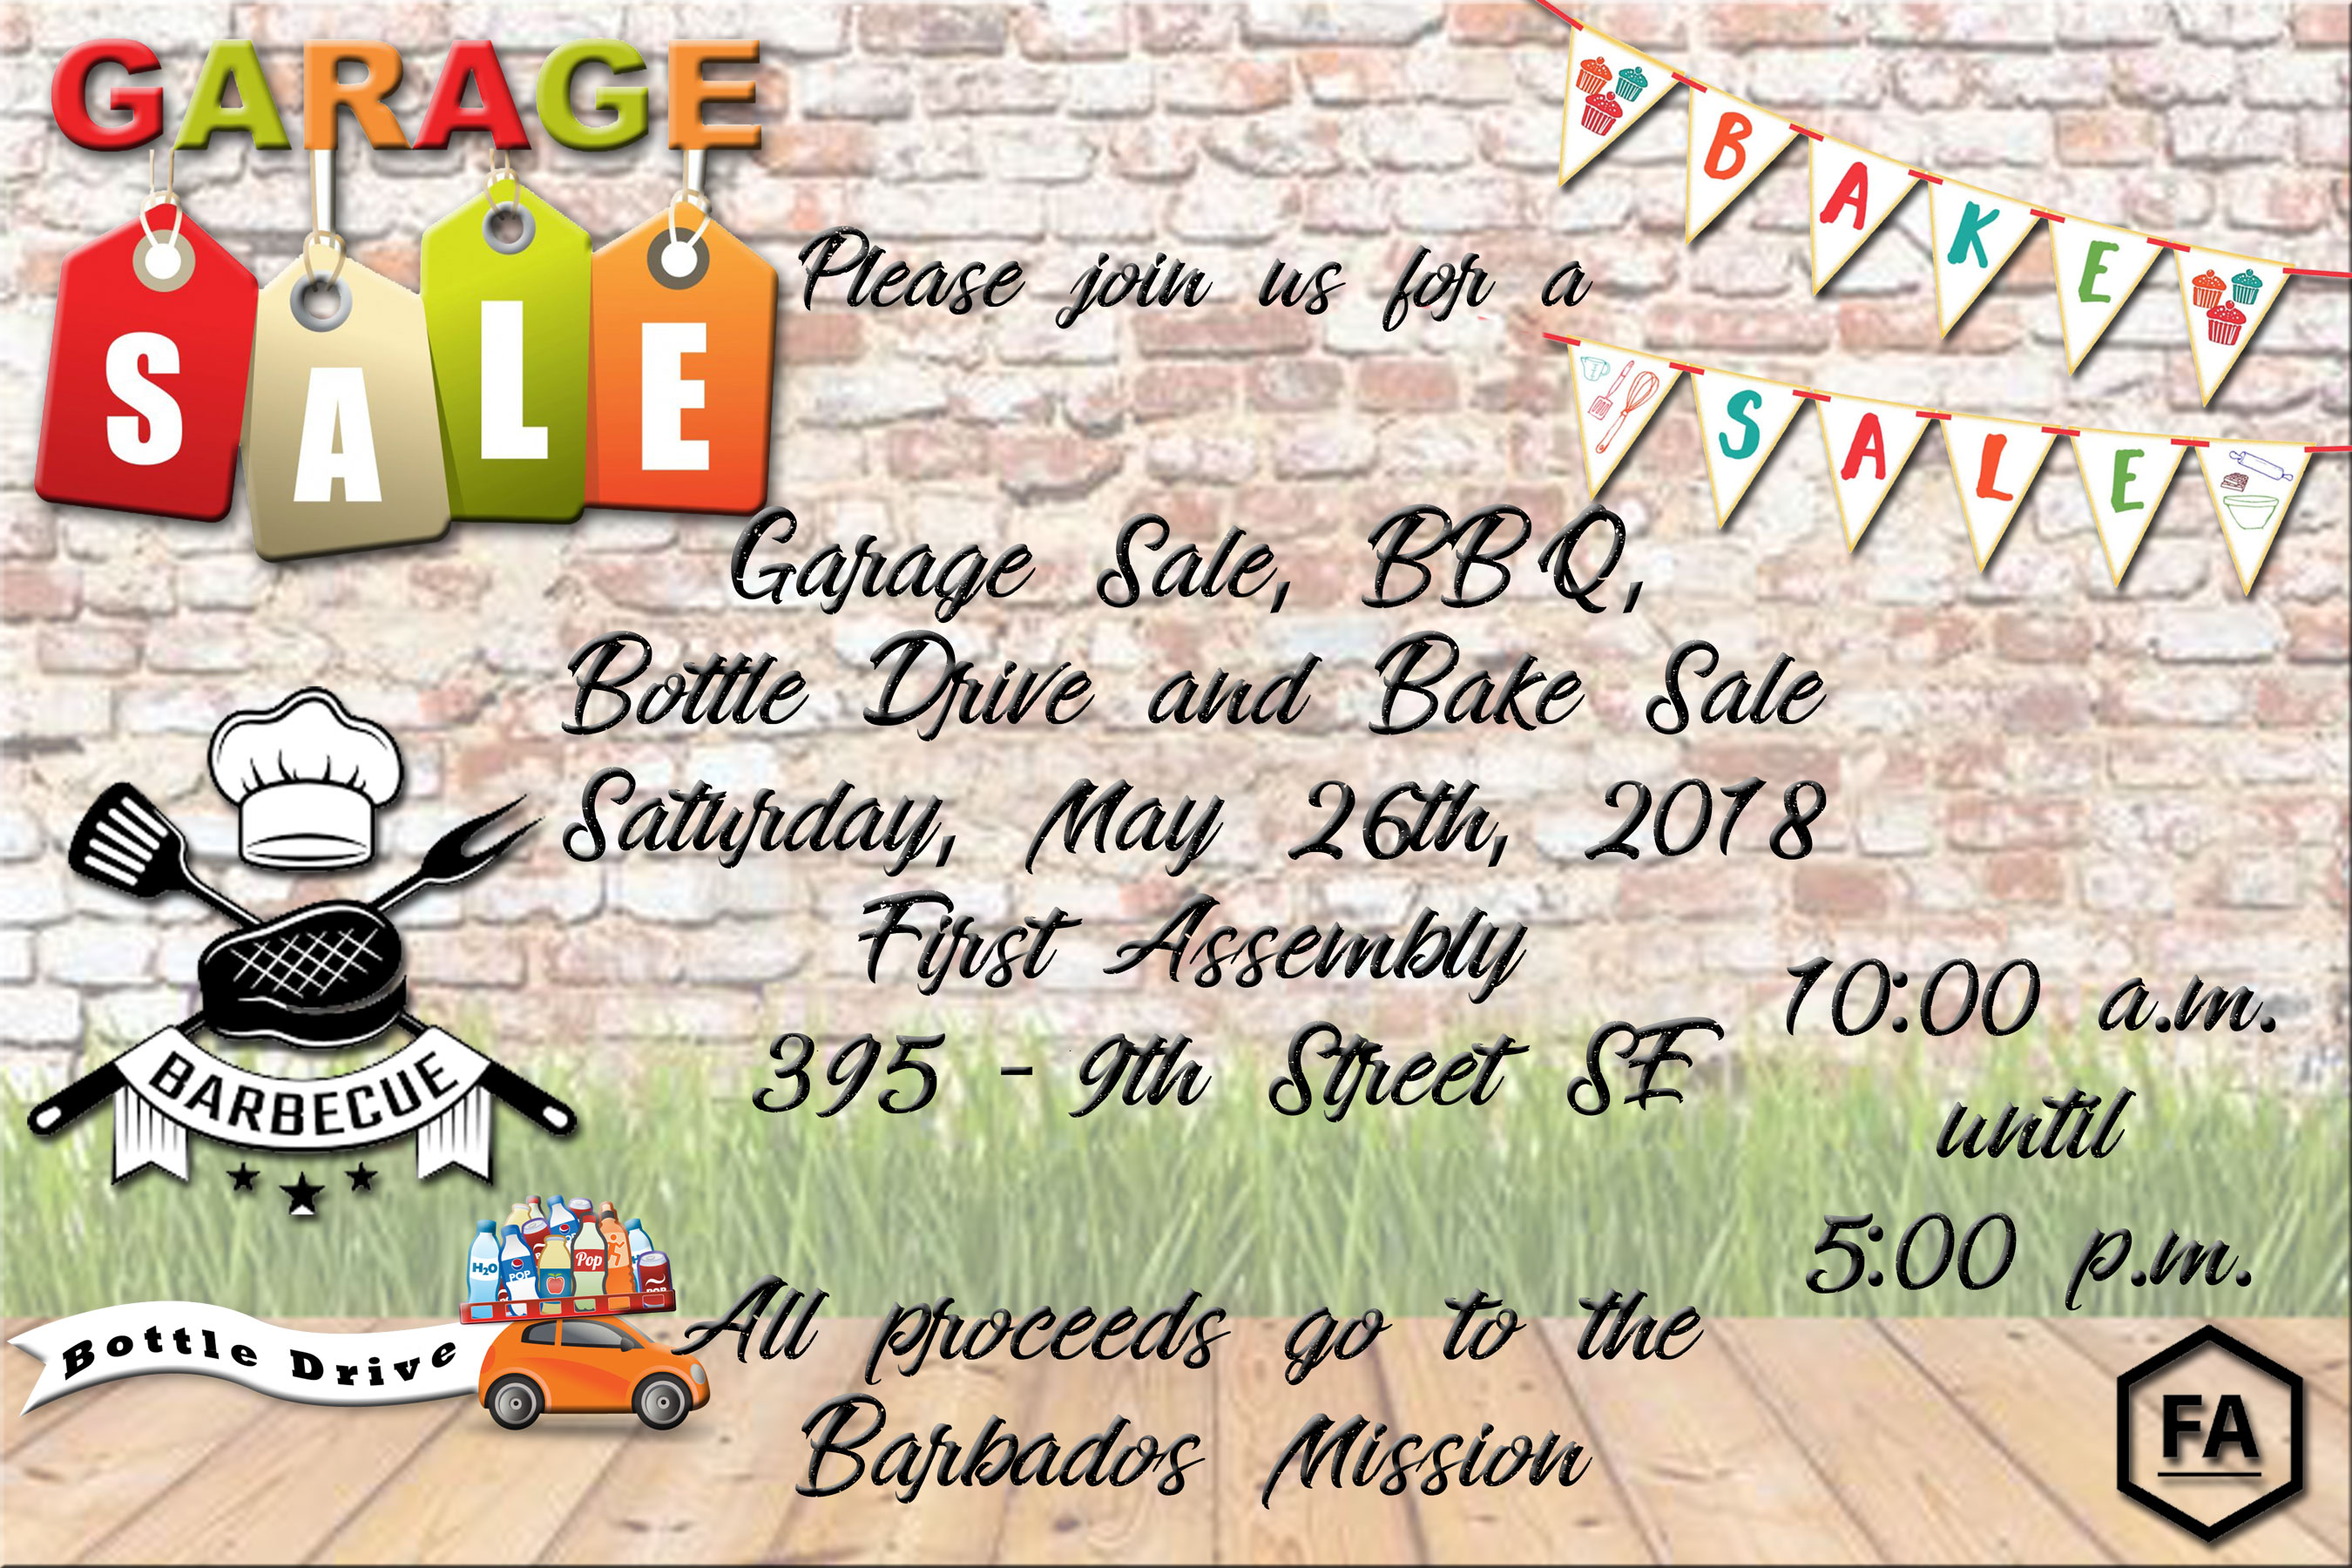 Garage Sale, Bake Sale, BBQ & Bottle Drive Fundraiser for Our